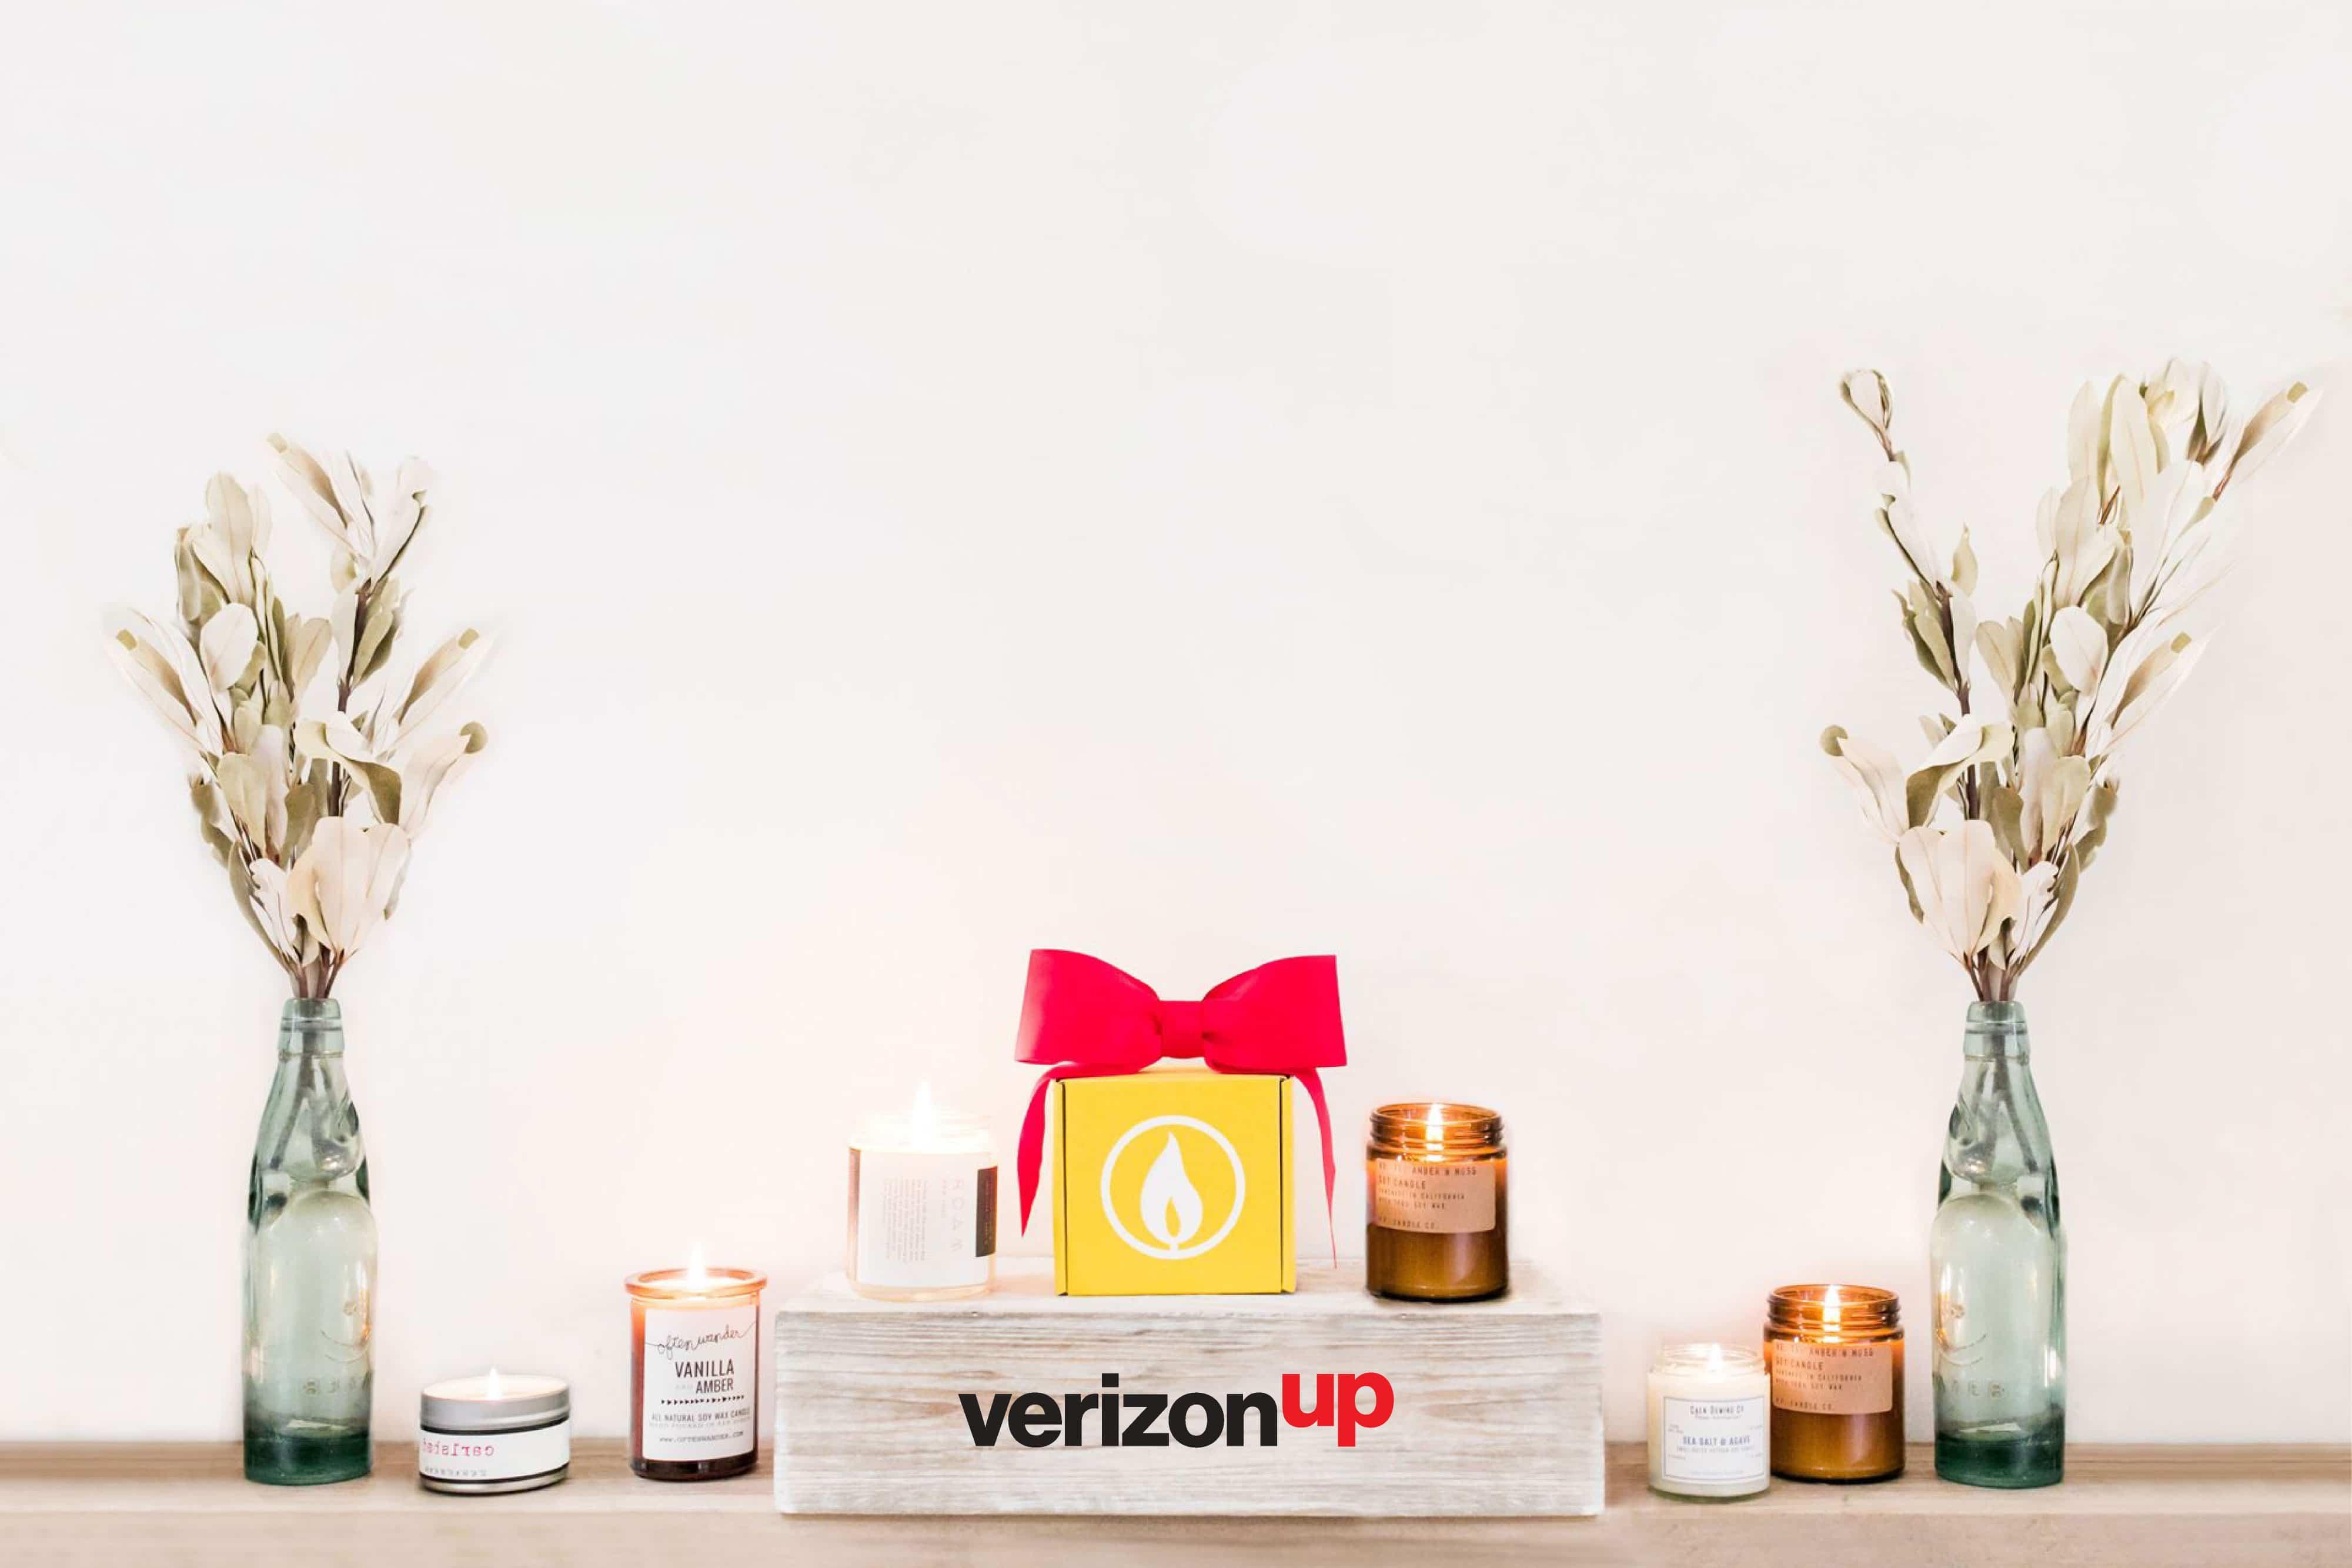 Welcome Verizon Up Members!